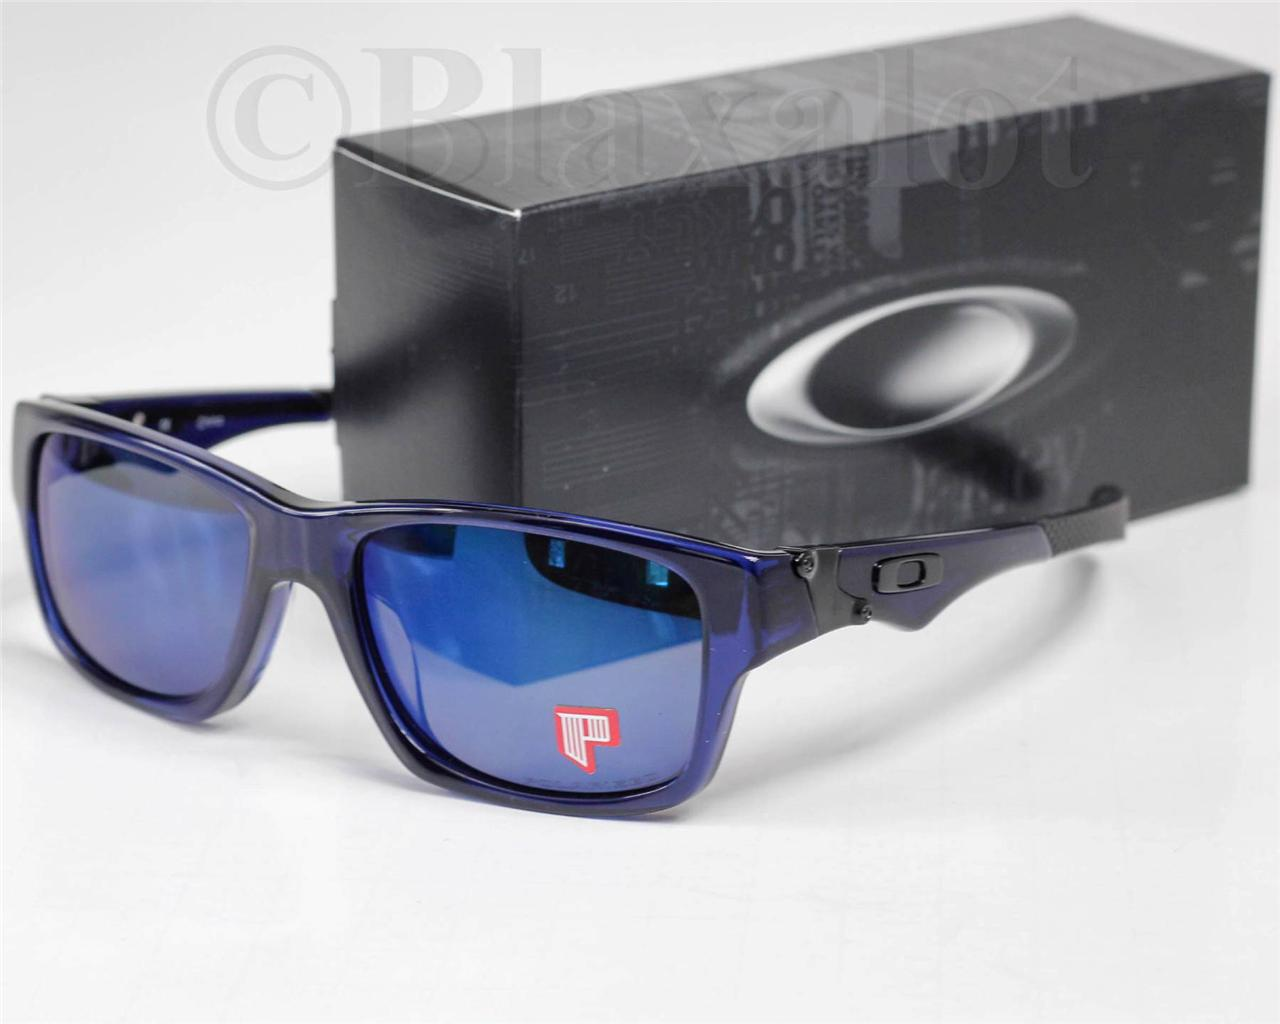 6b7738e89e Oakley Sunglasses Made China « Heritage Malta